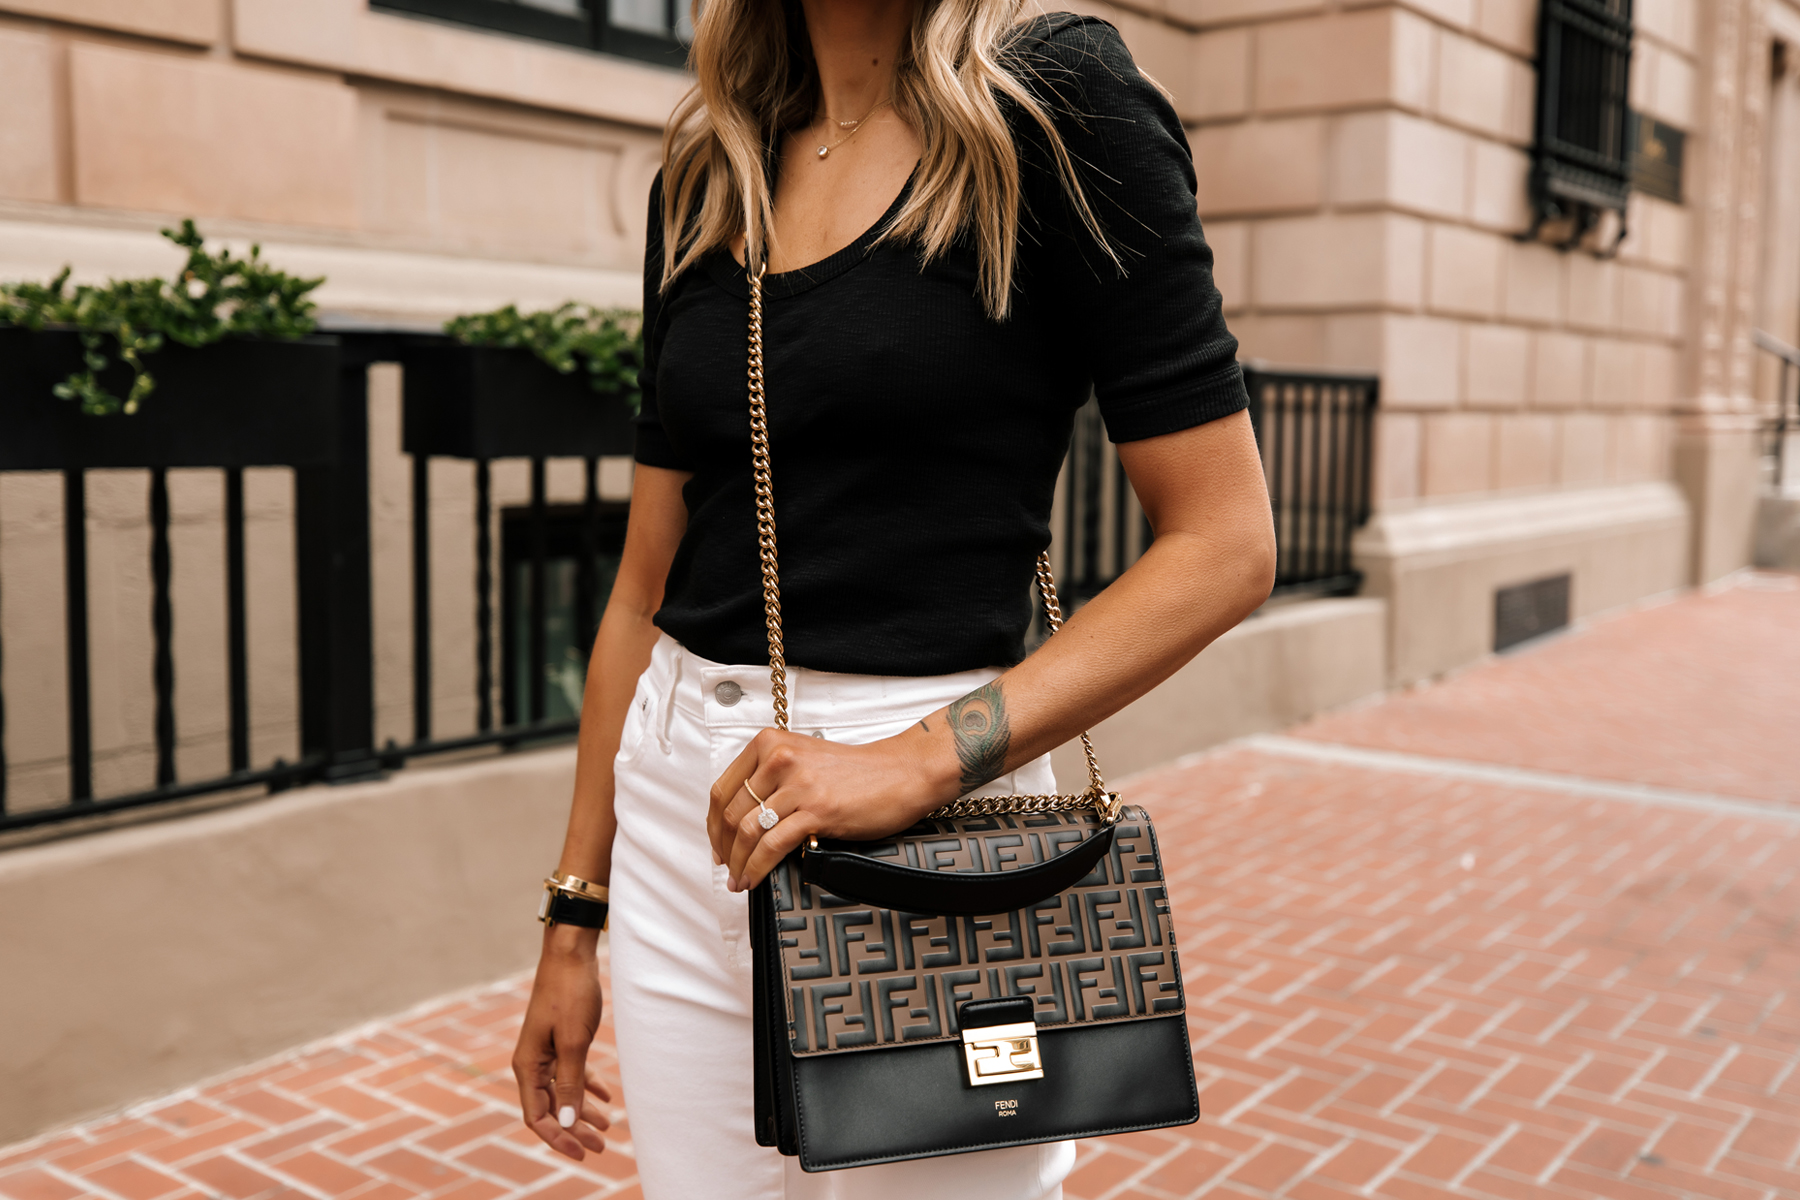 Fashion Jackson Wearing Black Scoop Neck Top White Jeans Fendi Ken U Medium Shoulder Bag 1